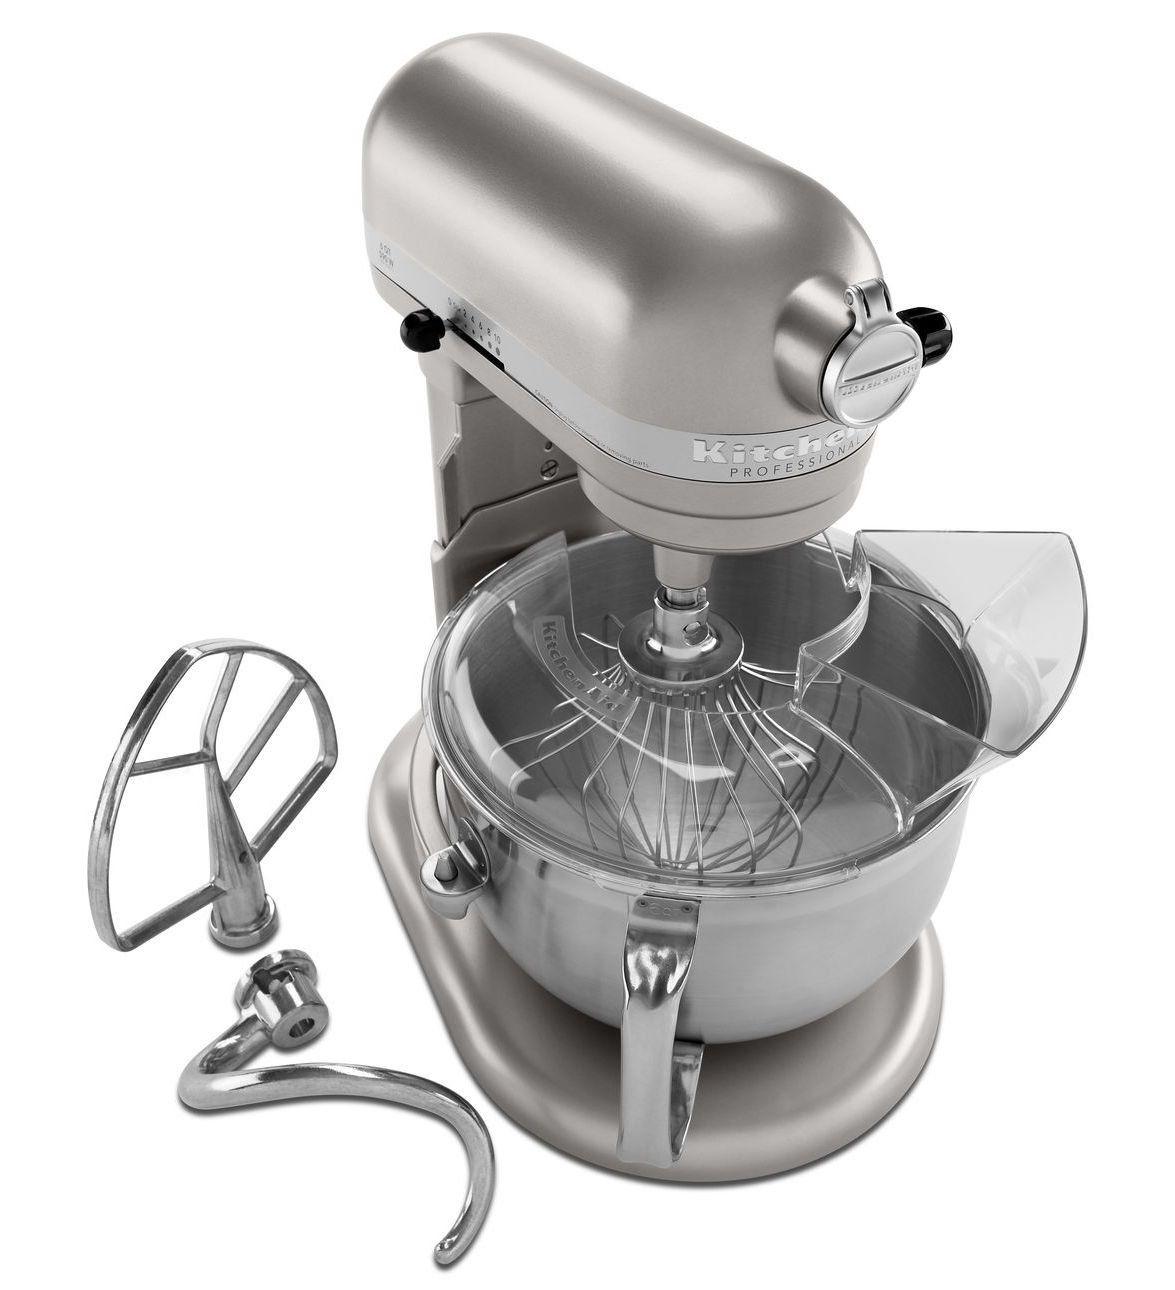 Kitchenaid professional series 6quart stand mixer